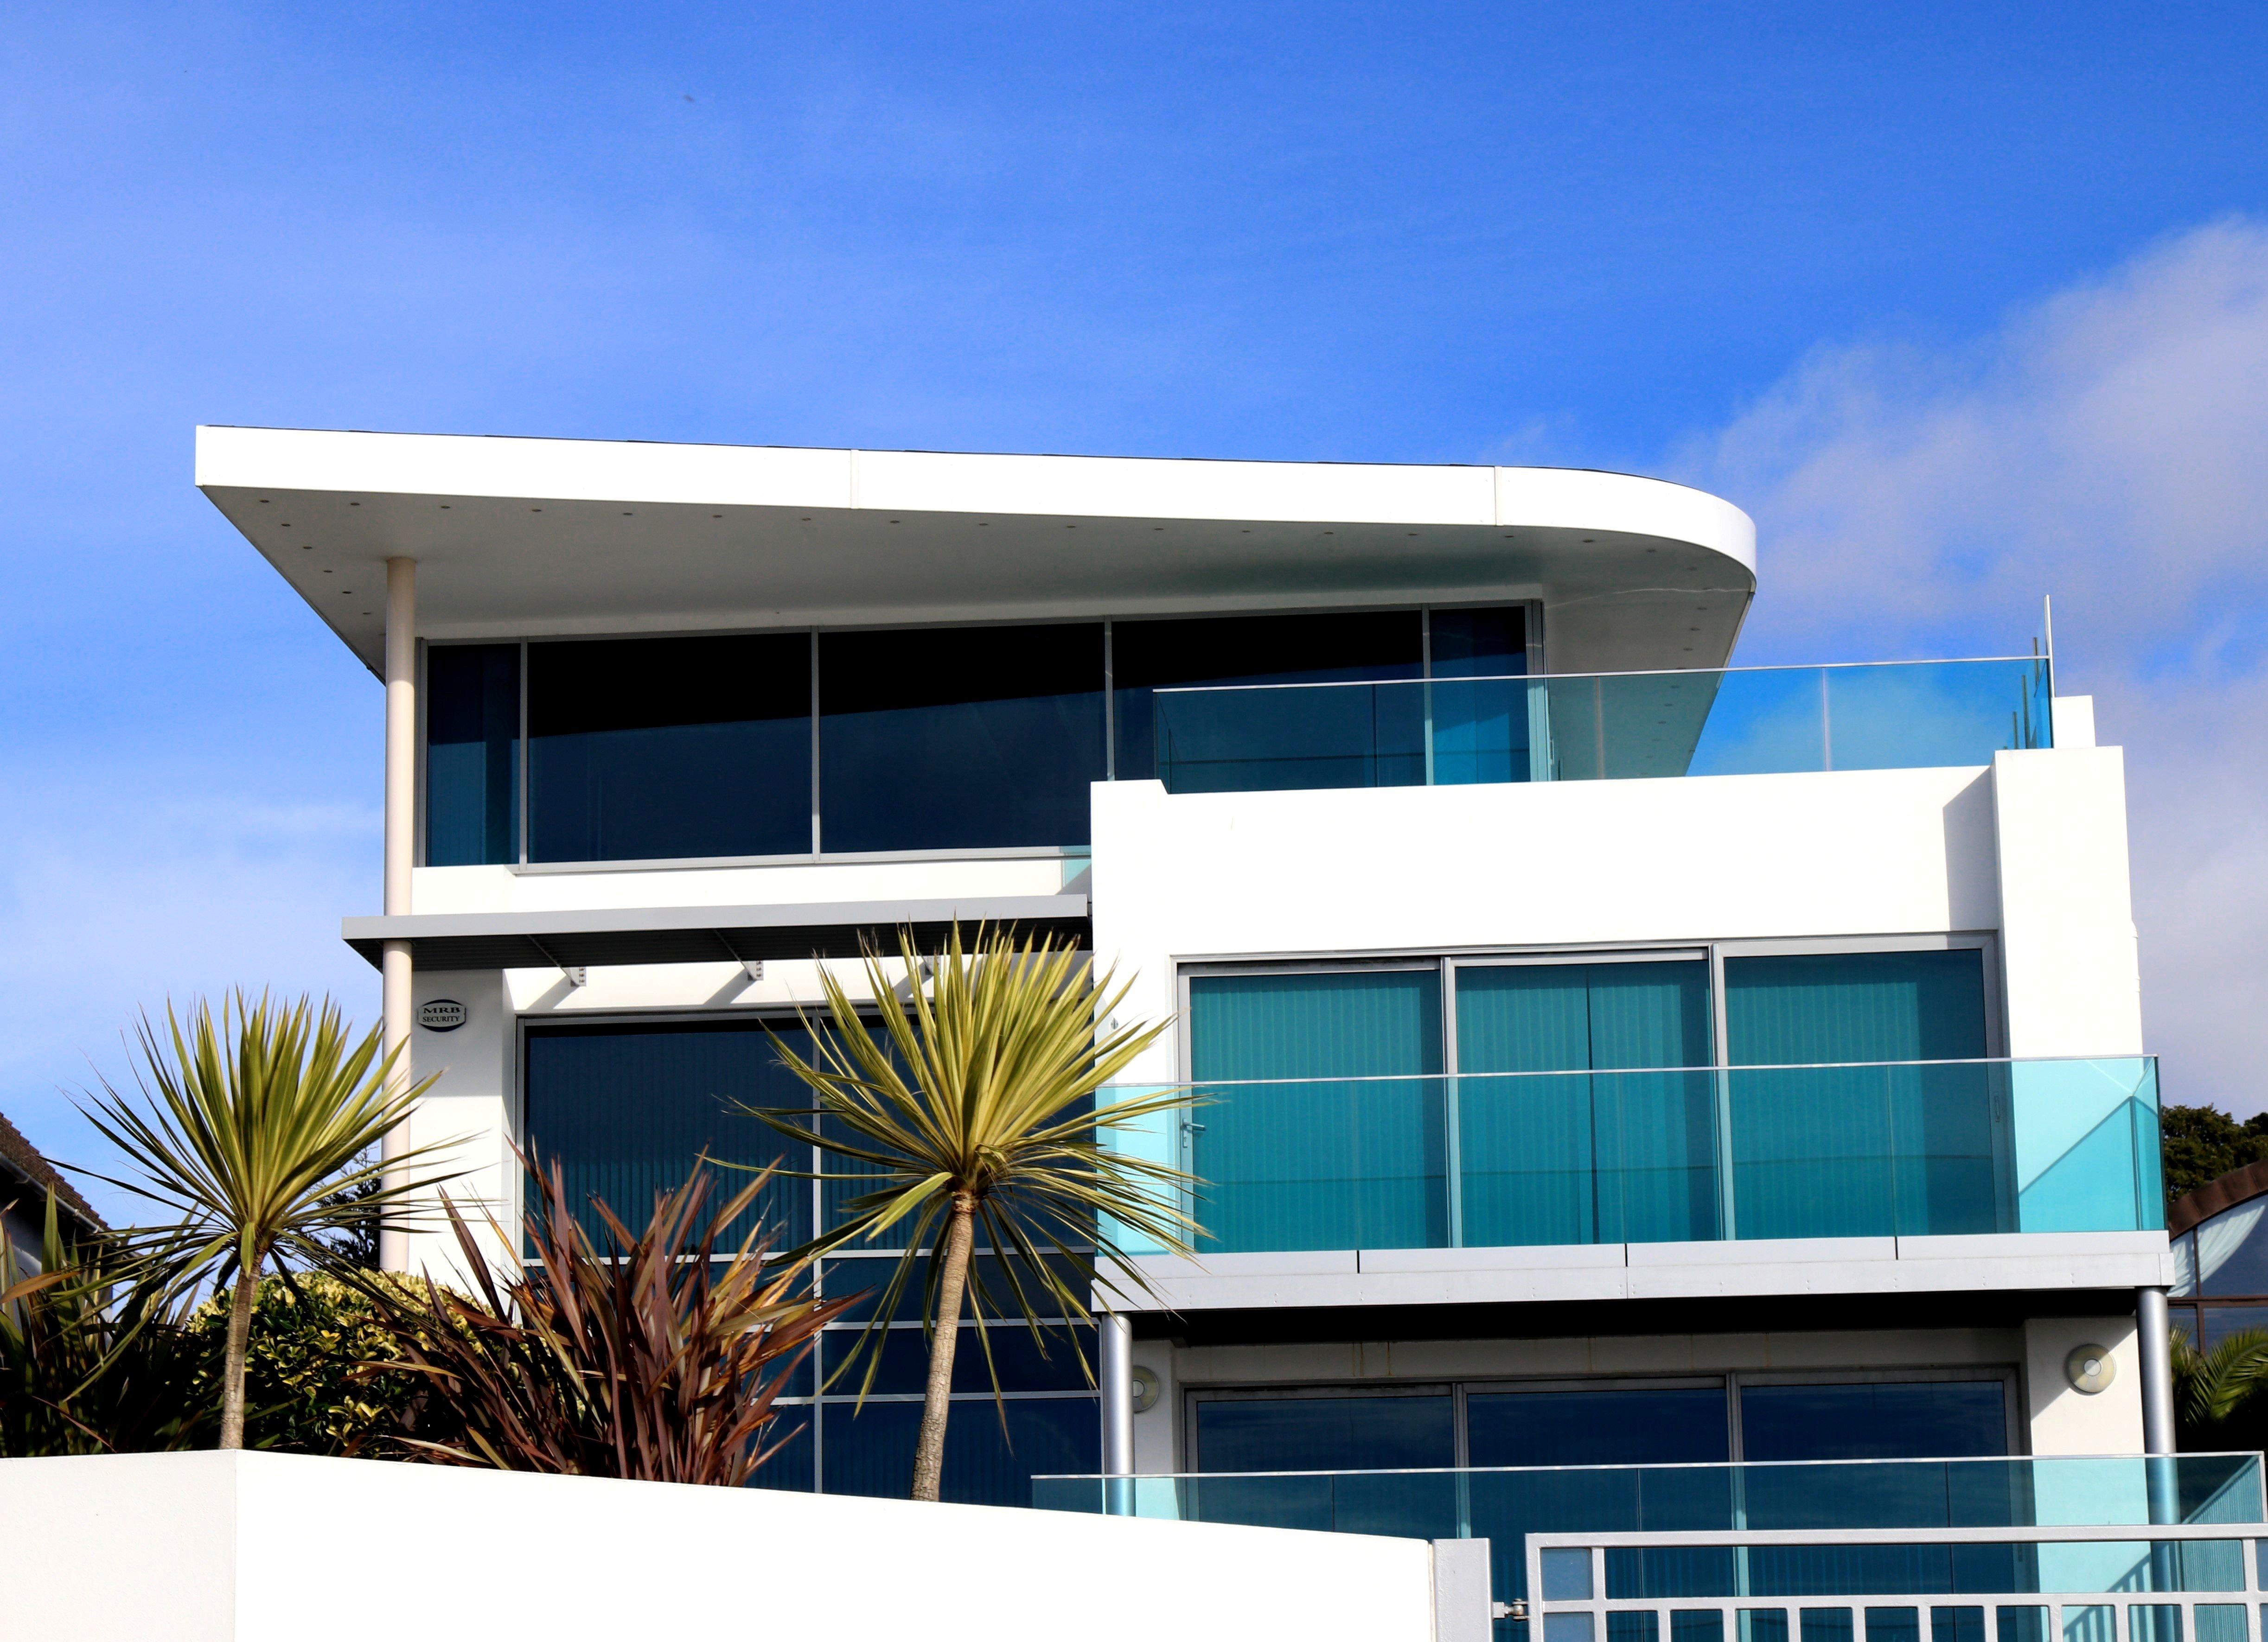 apartment-architectural-design-architecture-323775